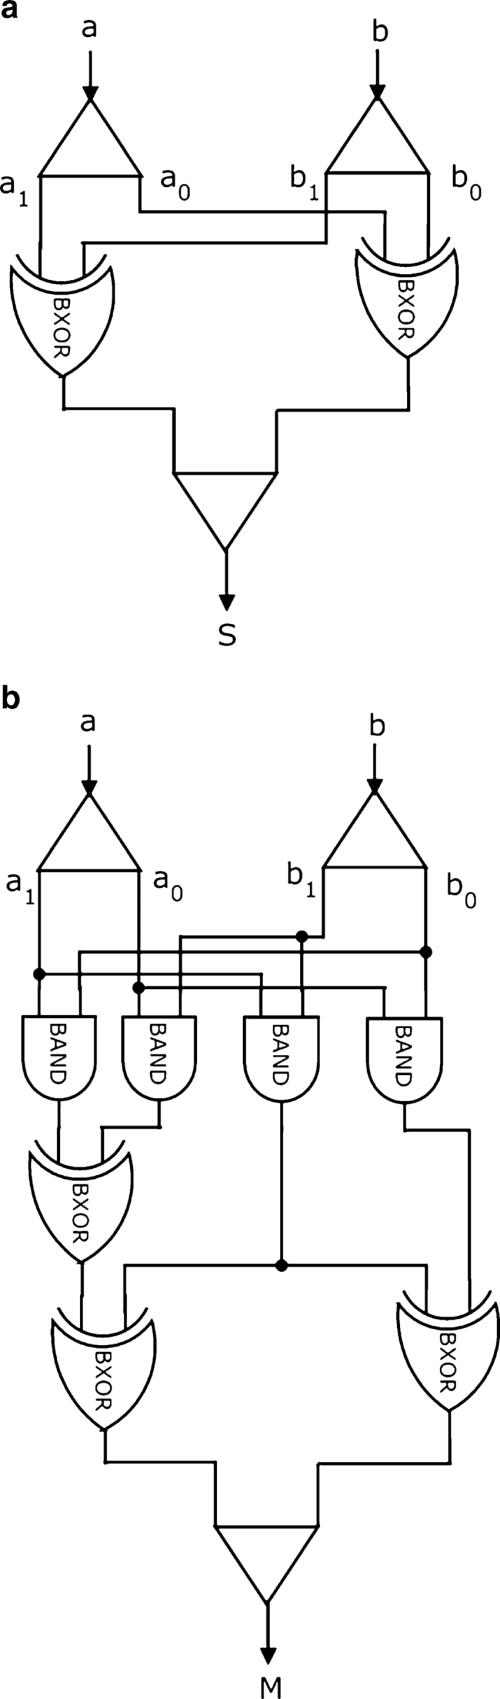 small resolution of gf 4 a addition b multiplication circuit block diagram bxor binary xor gate